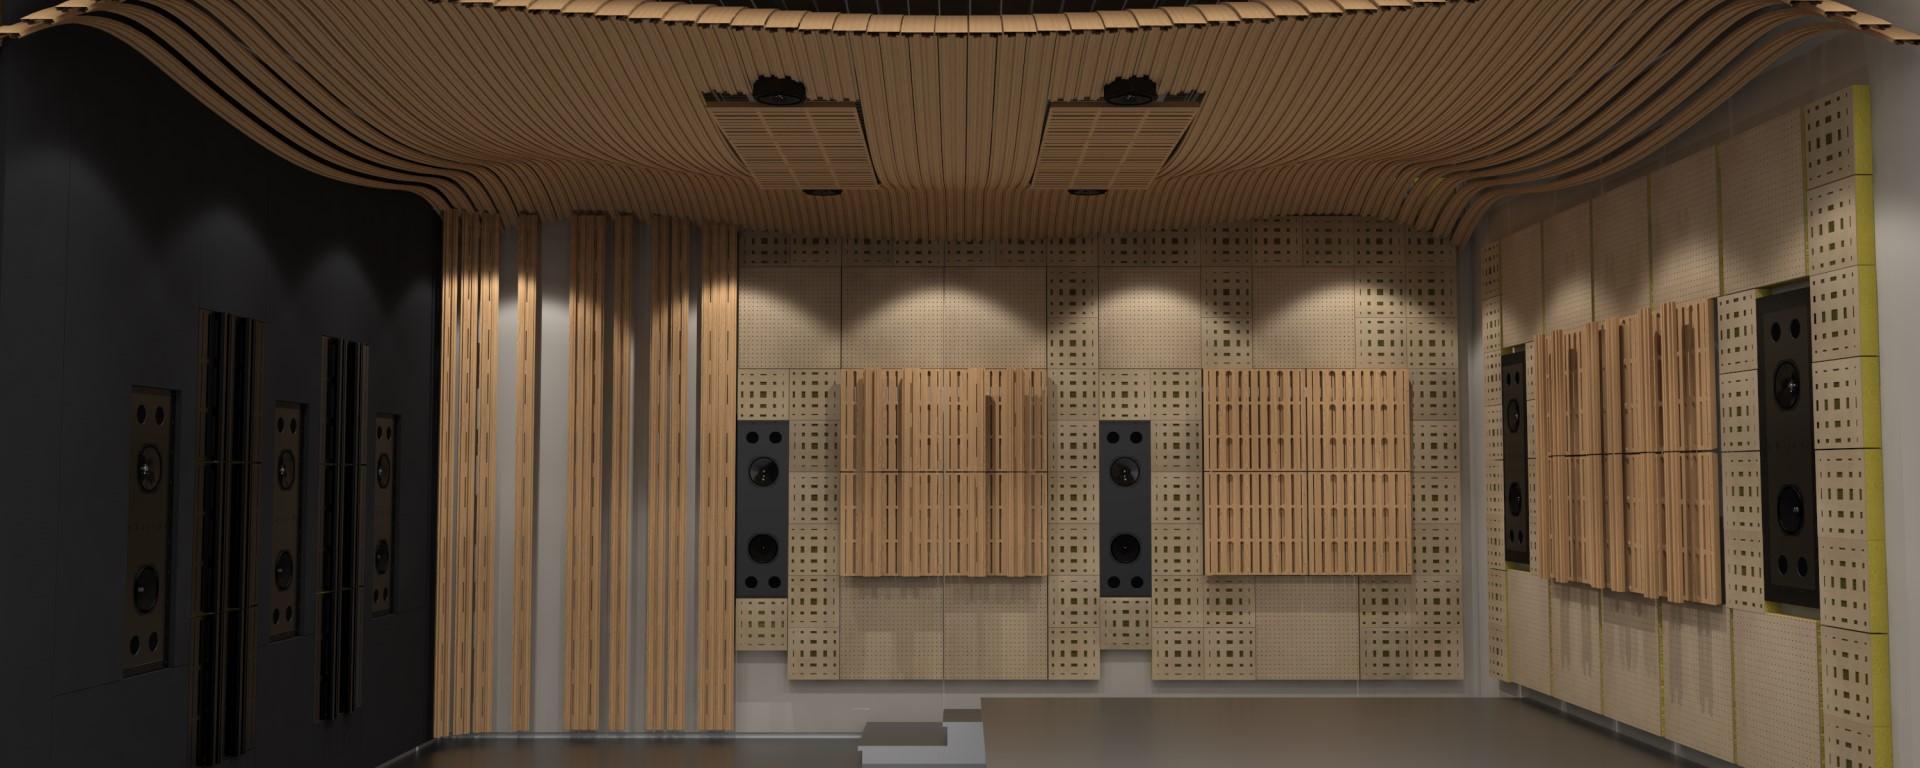 Theatre Acoustics Before Fabric